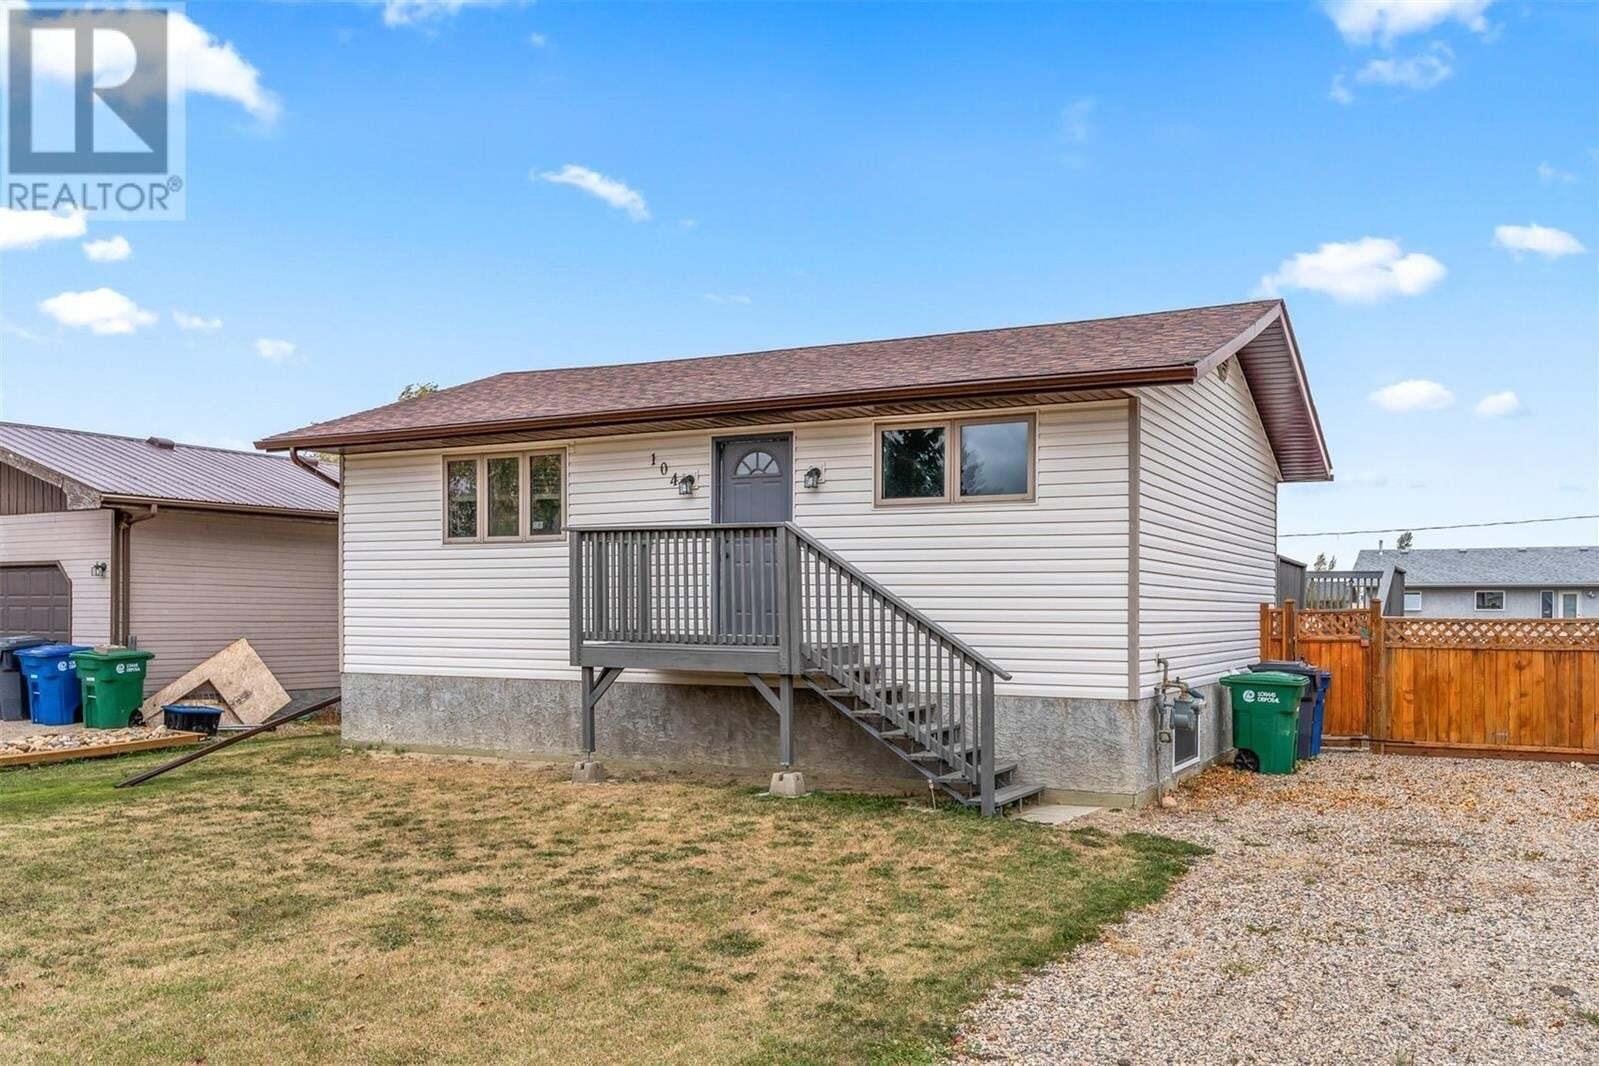 House for sale at 104 Eden St Edenwold Saskatchewan - MLS: SK828222